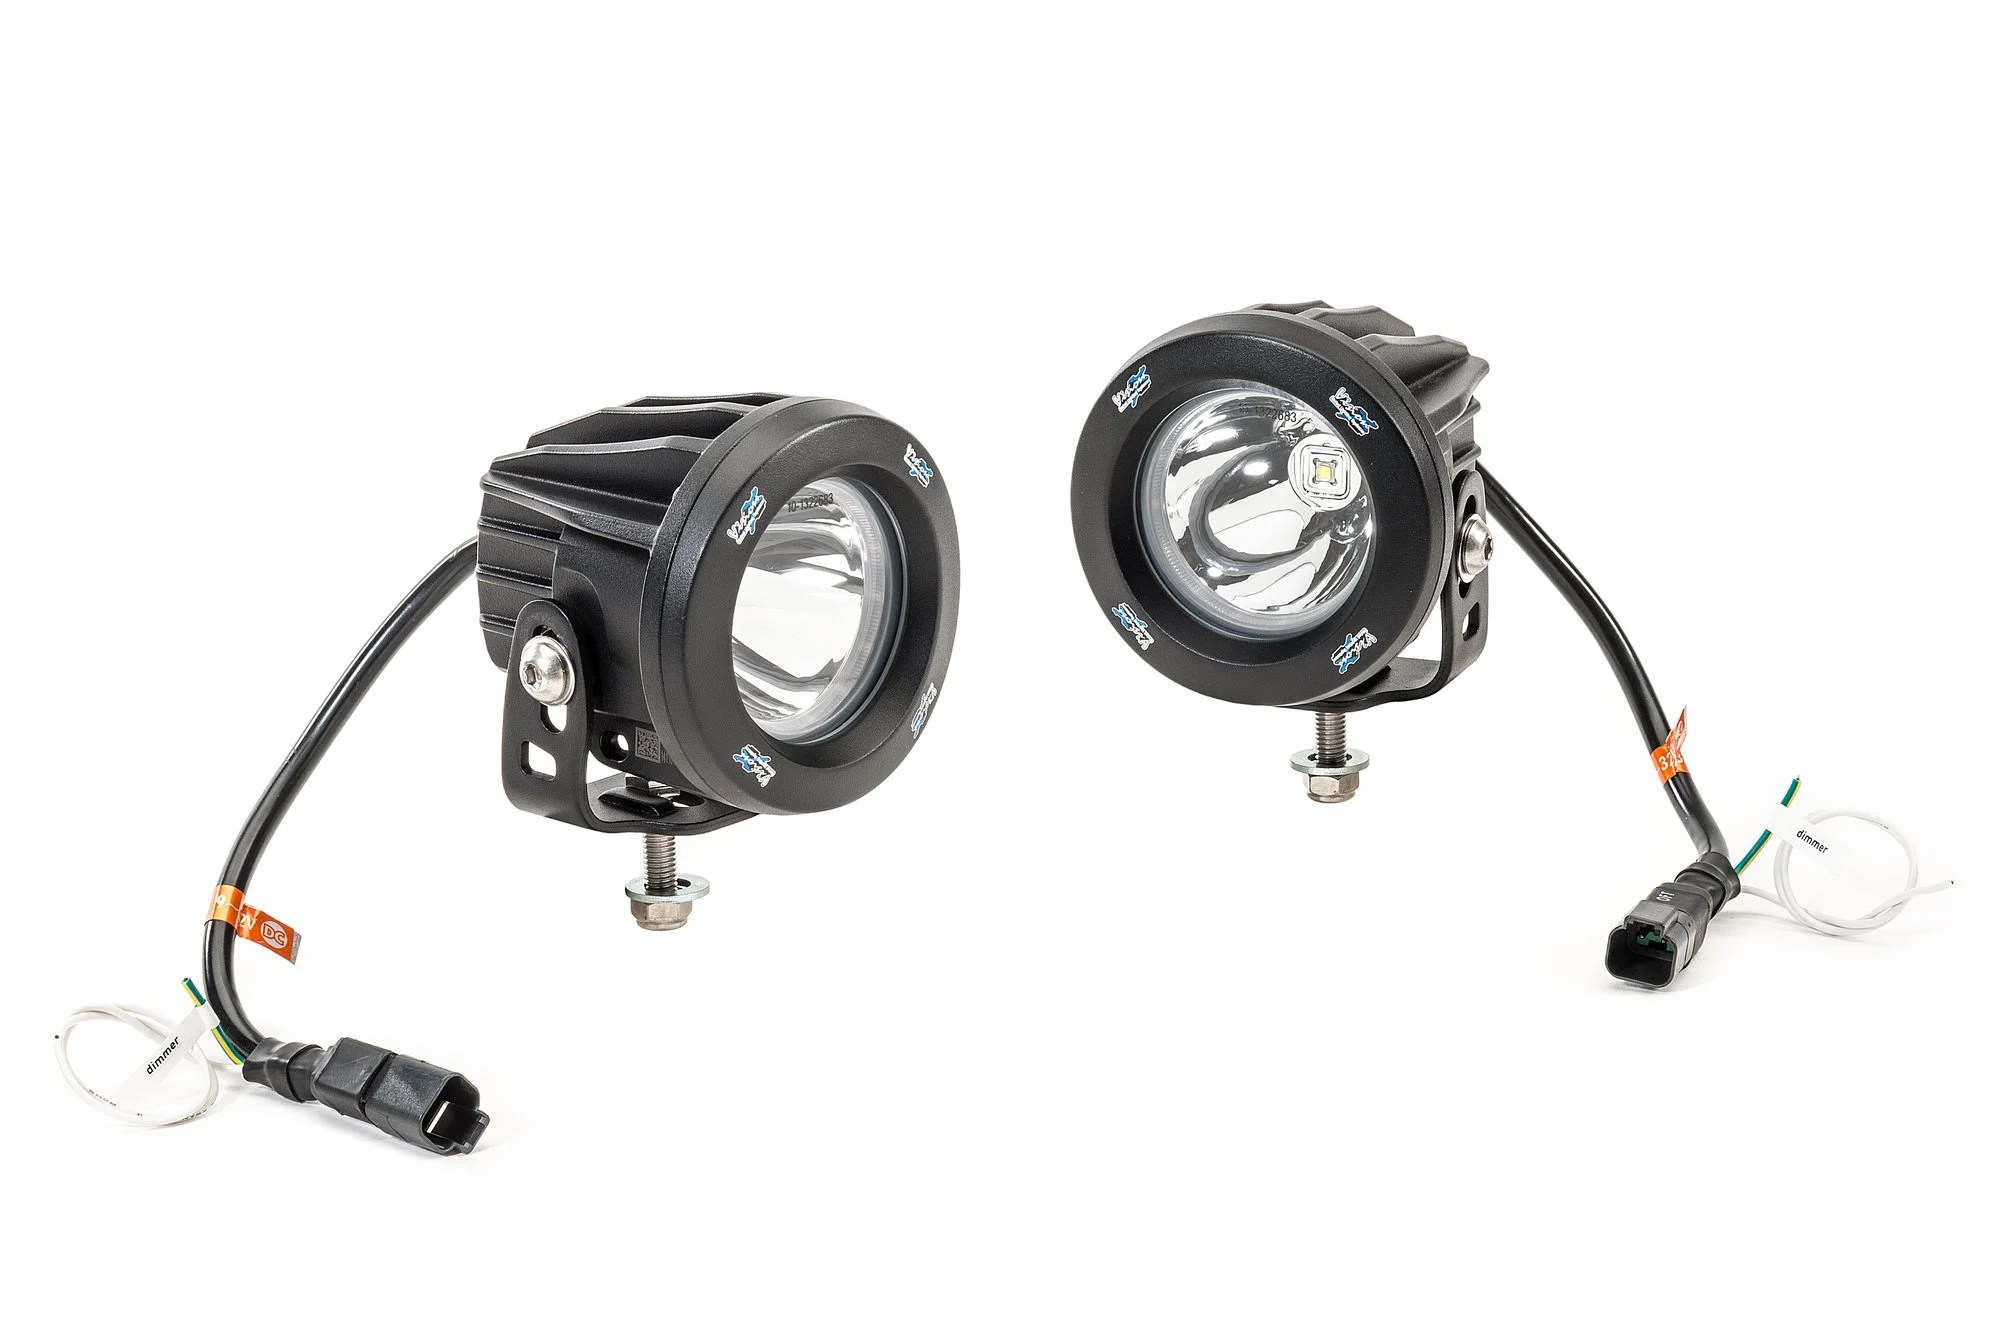 Vision X Lighting Optimus Round Prime Light Kit In Black